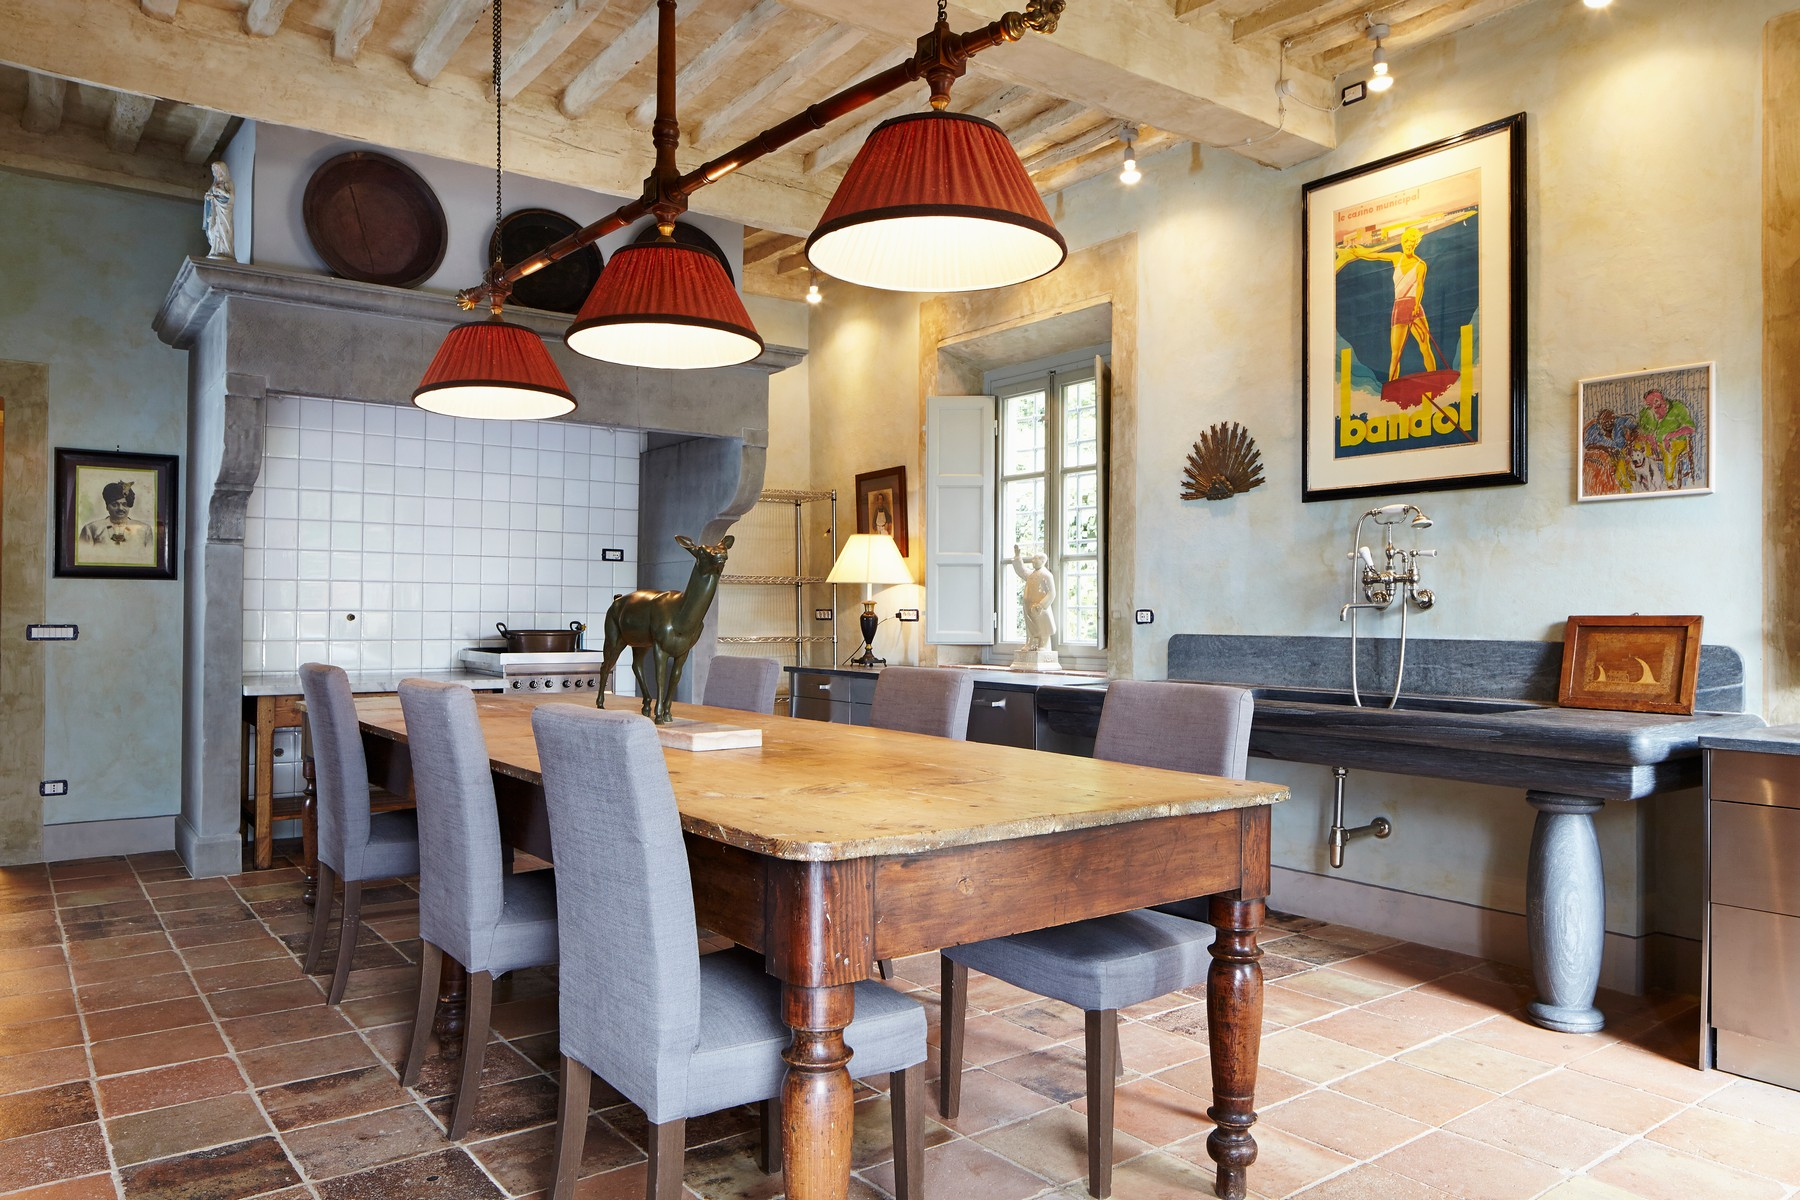 Villa in Vendita a Lucca: 5 locali, 2500 mq - Foto 6